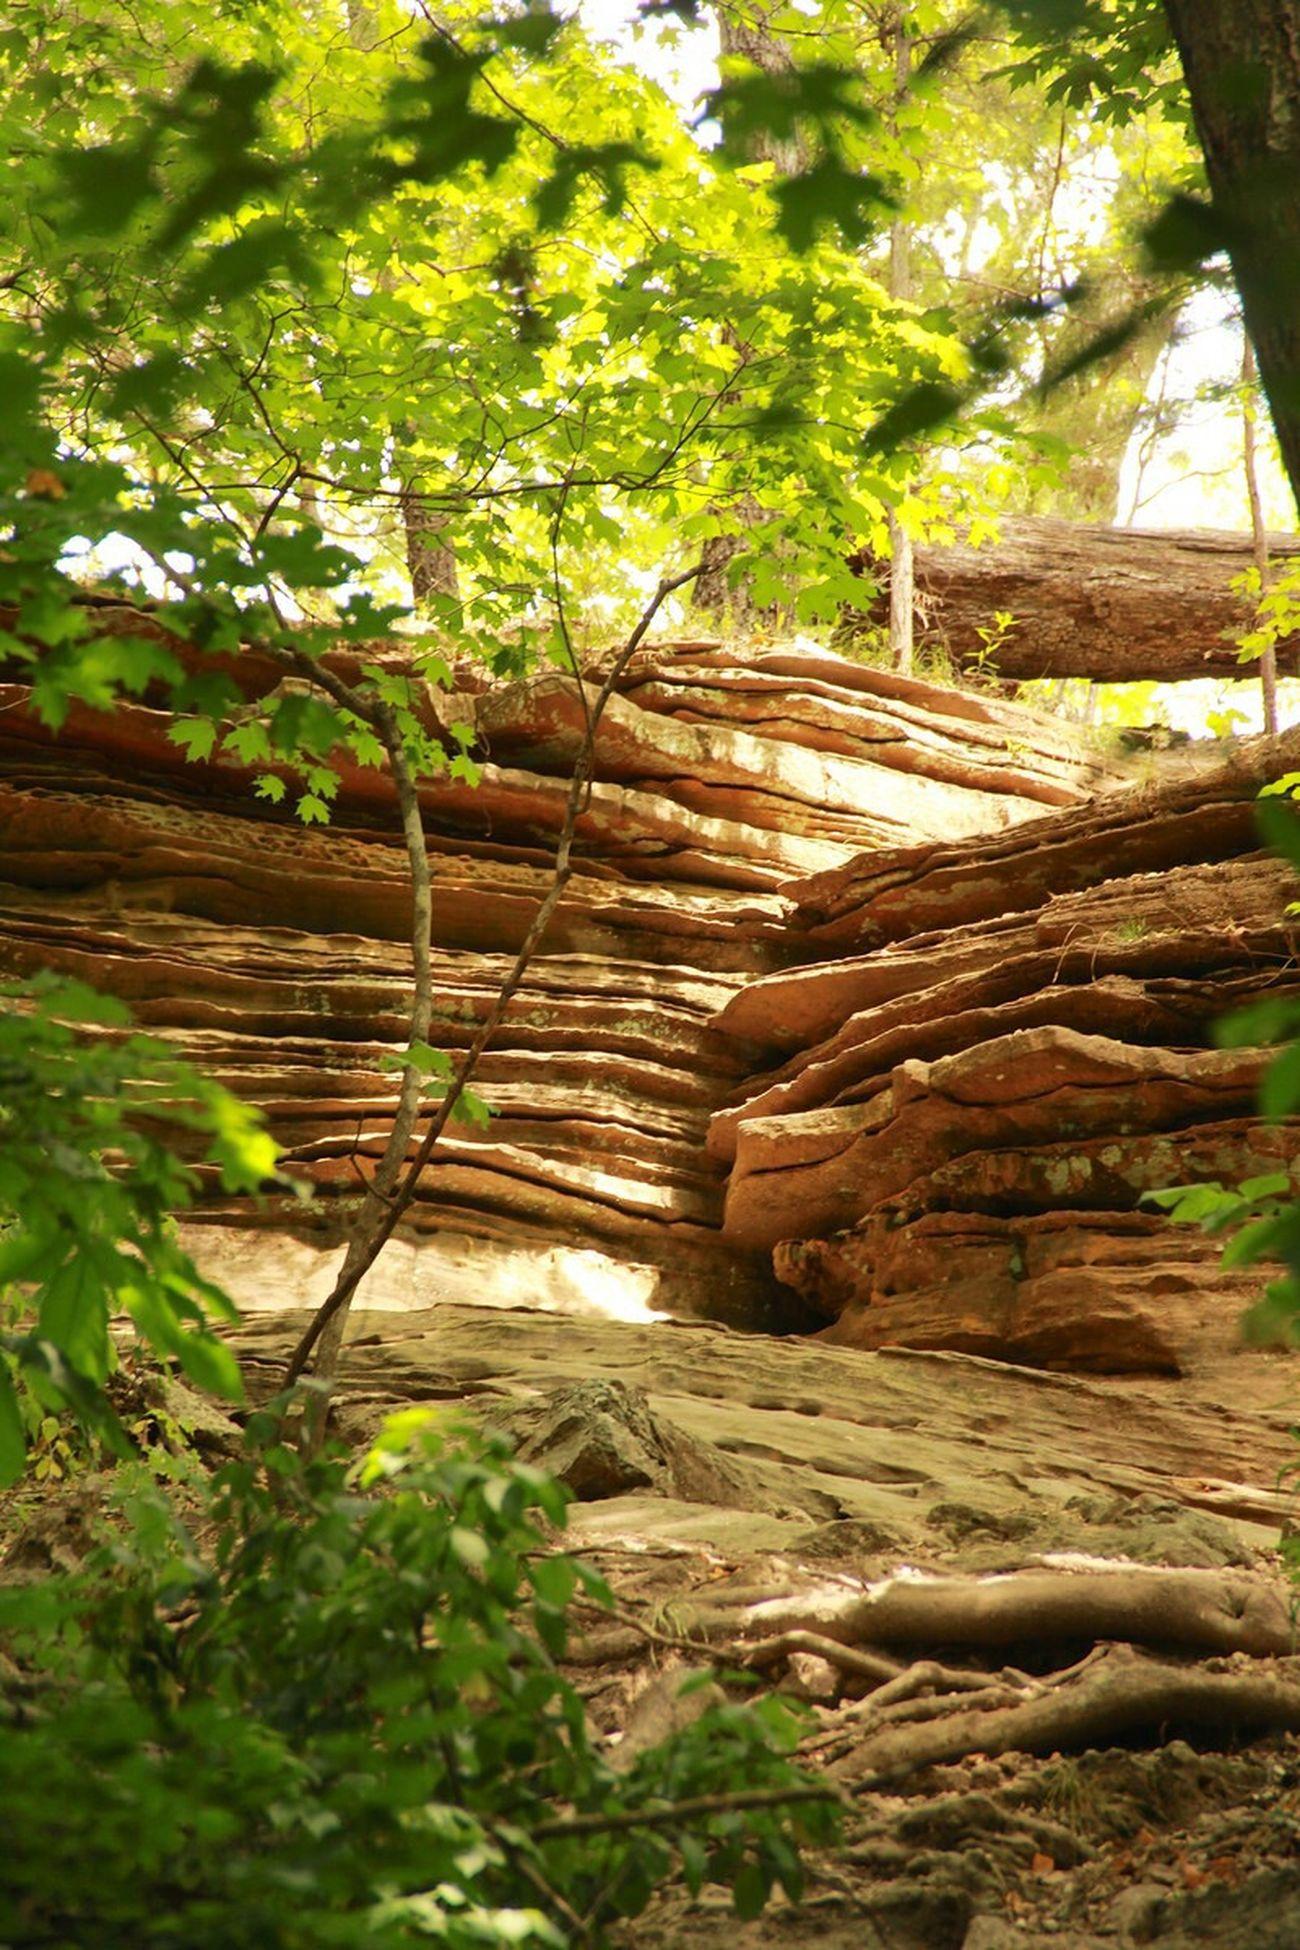 Rocks Stratification Nature